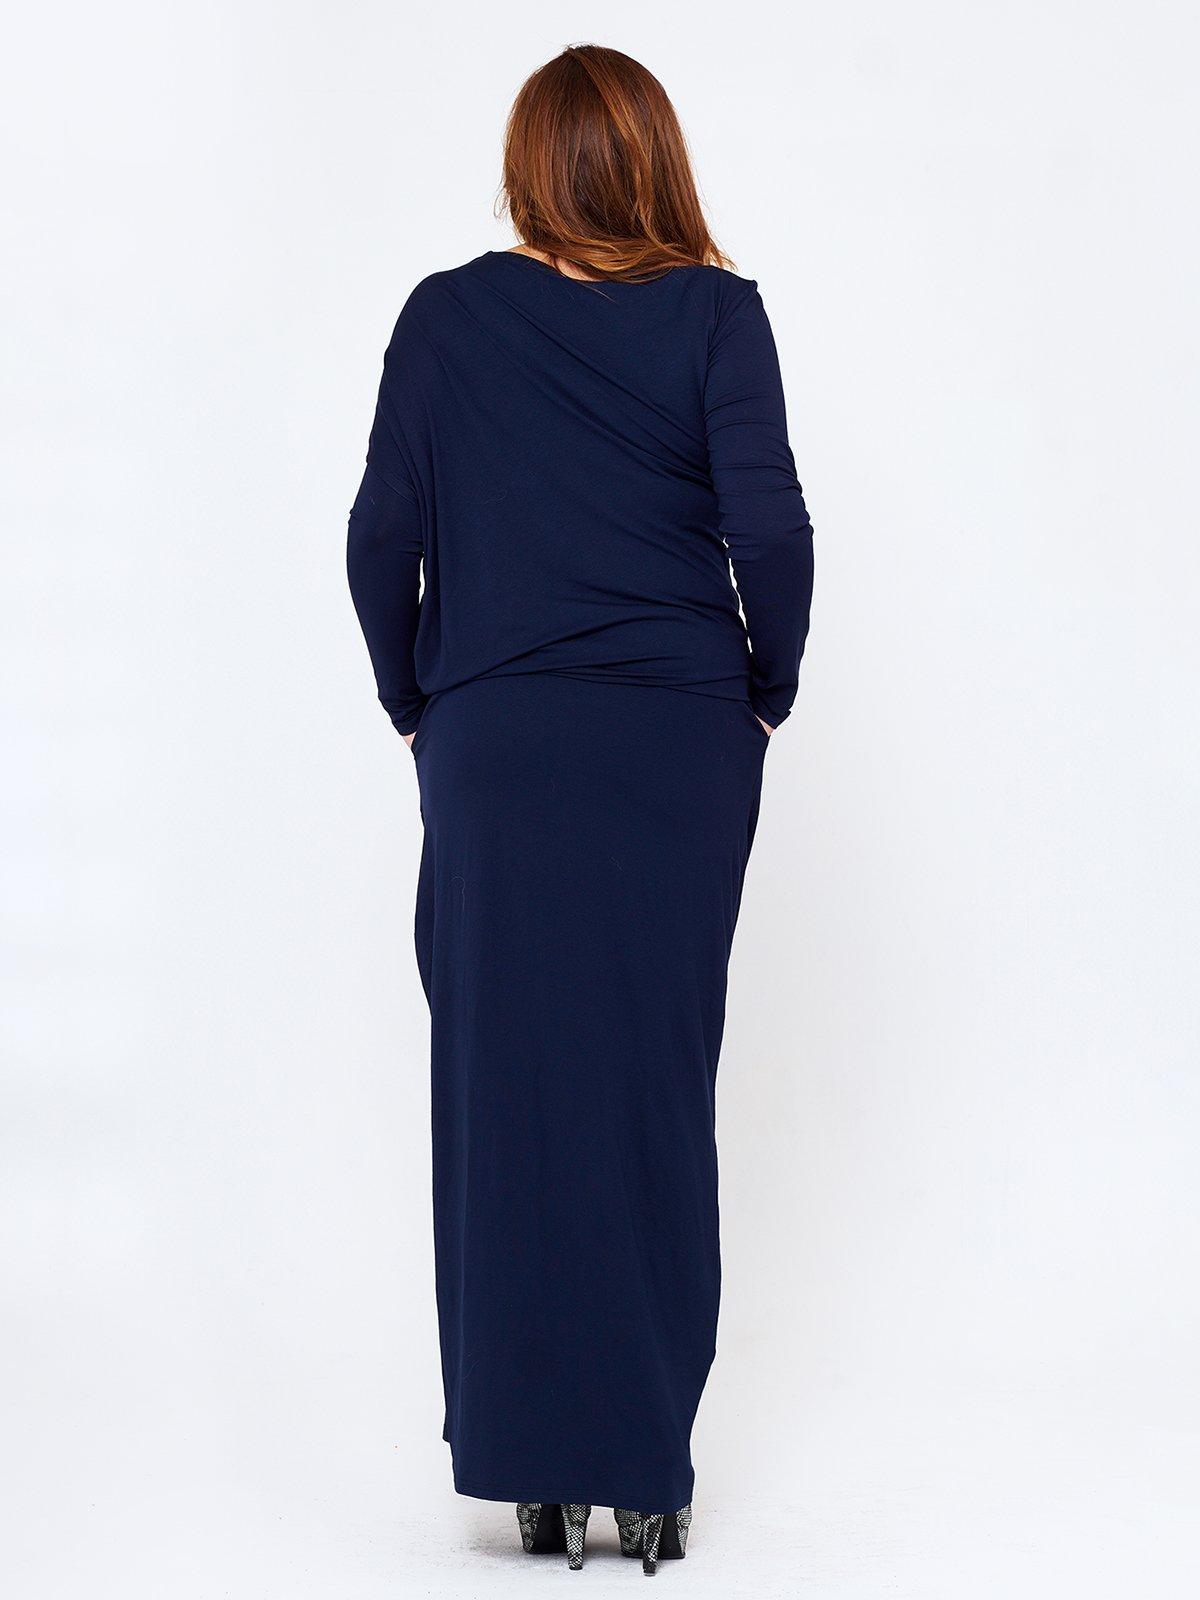 Платье темно-синее   2714661   фото 2